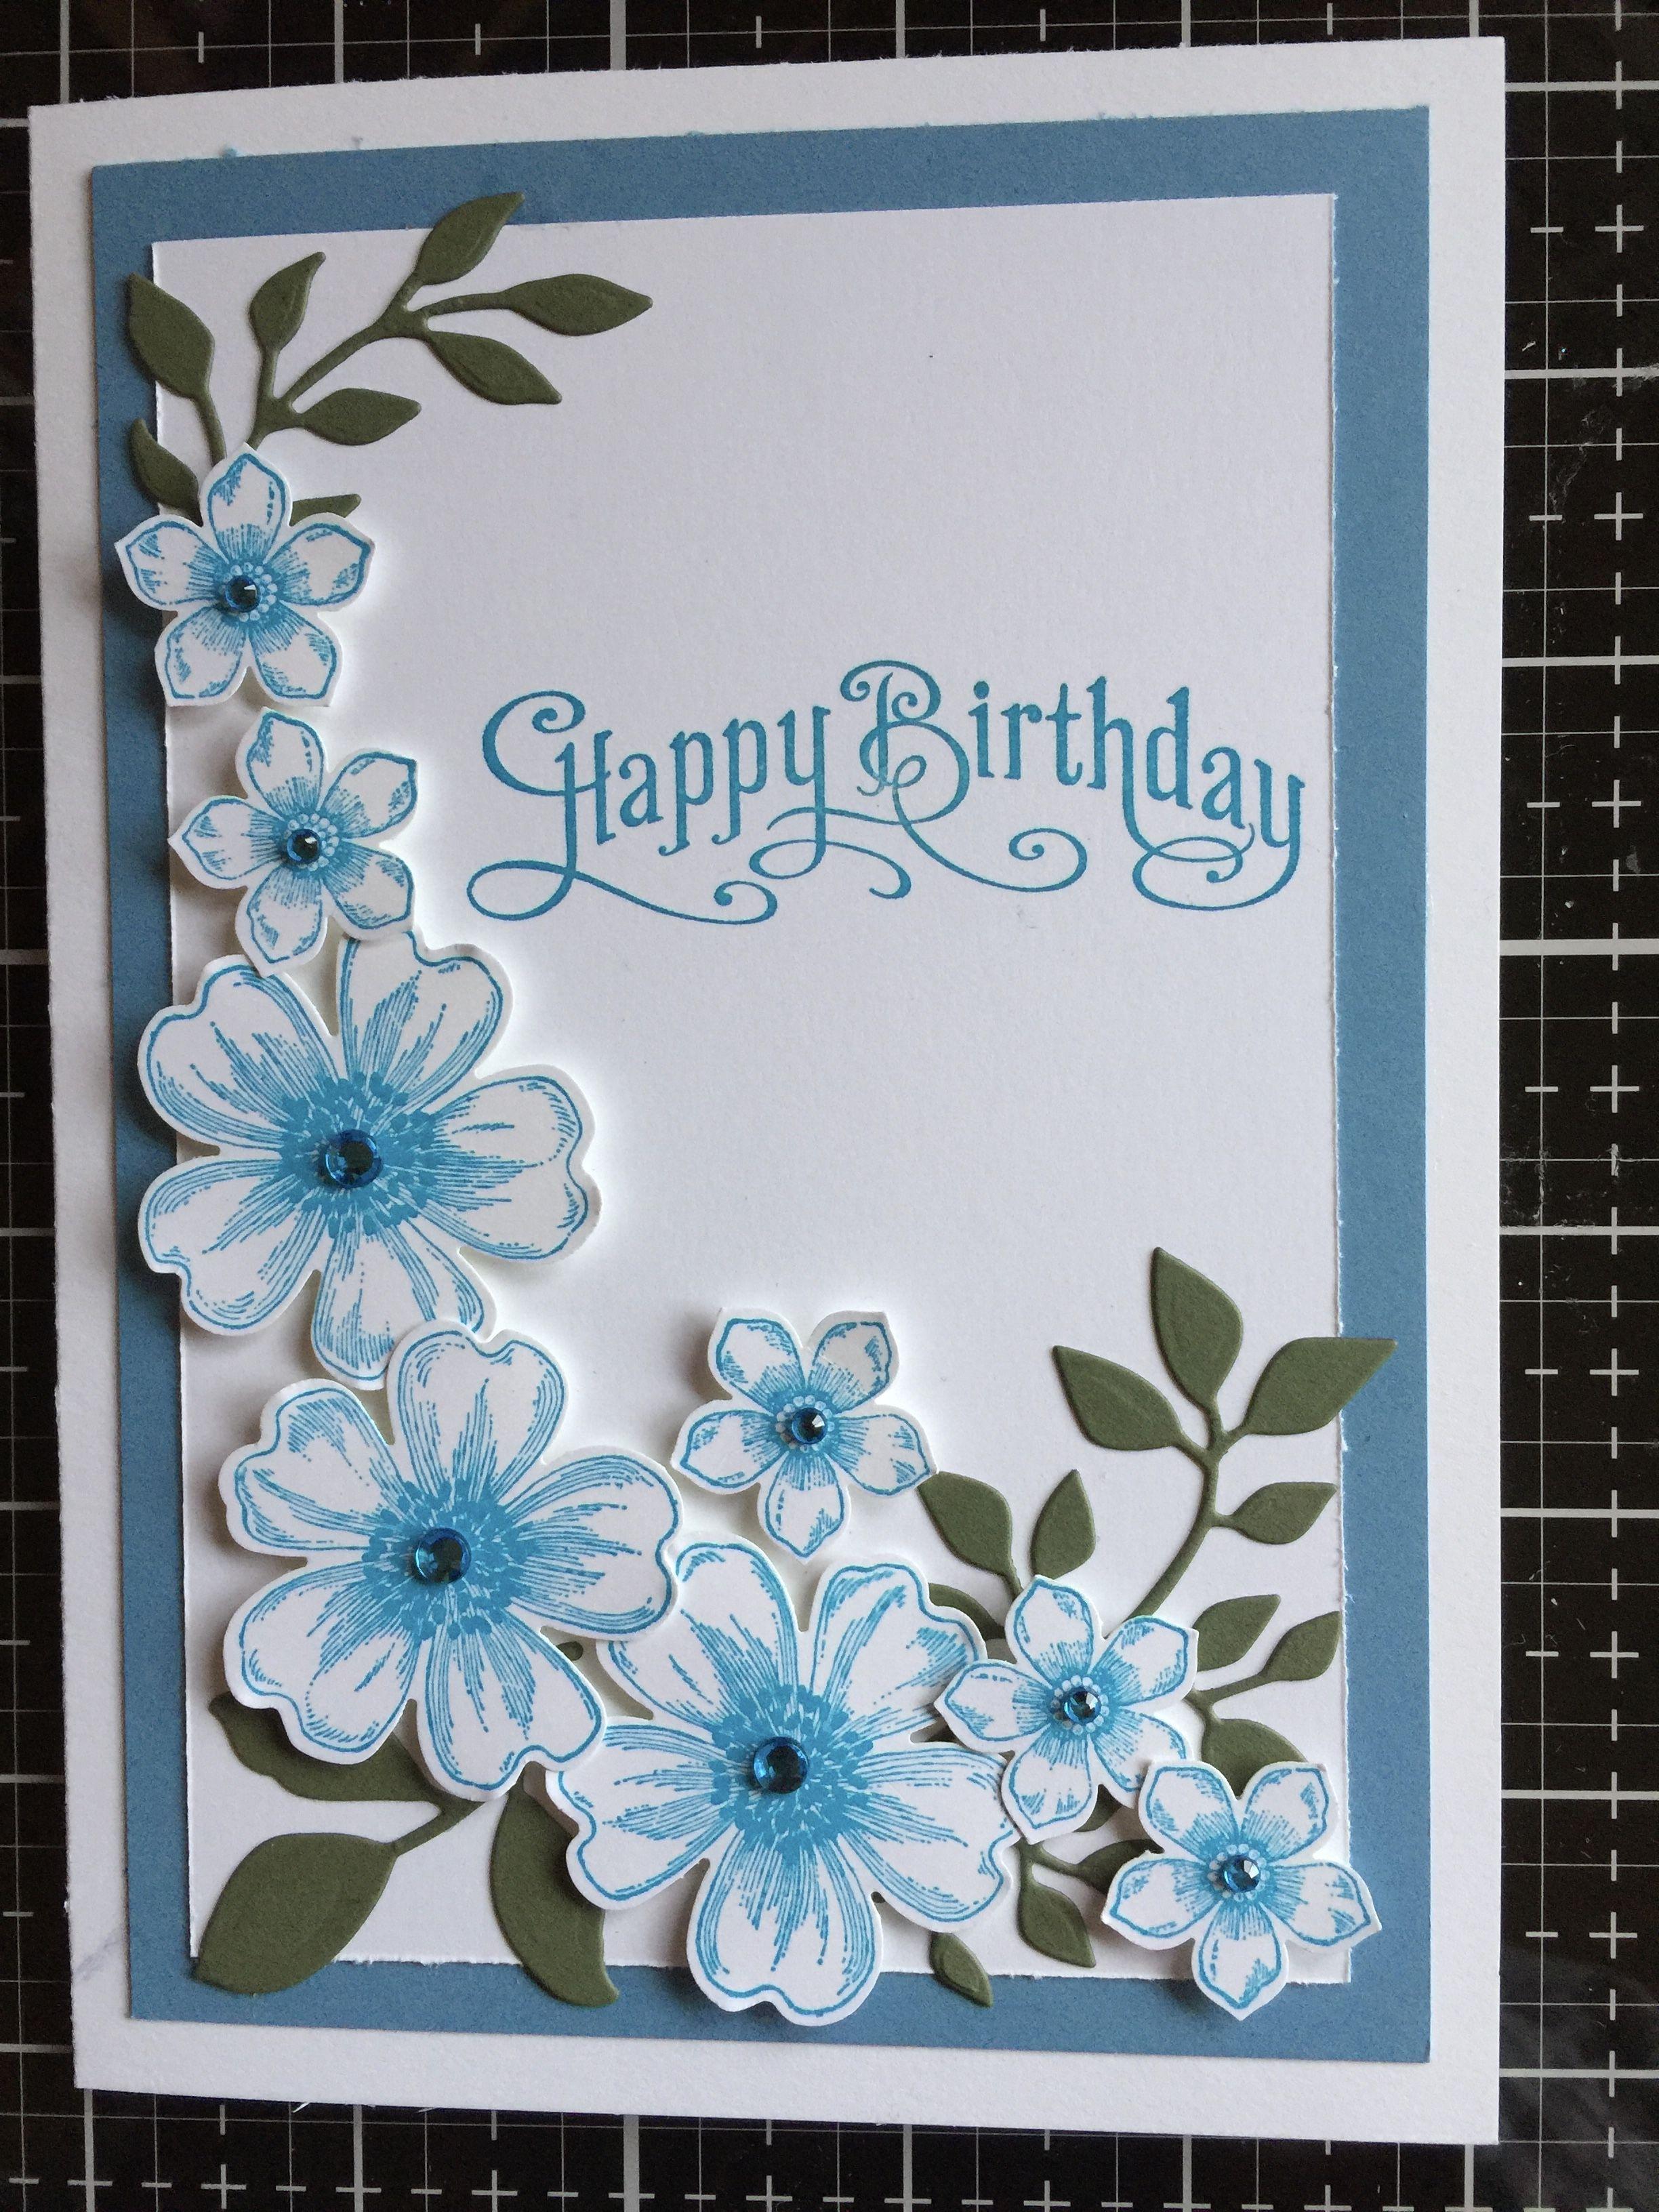 Pin by Carole Jepsen on Flower Shop Cards